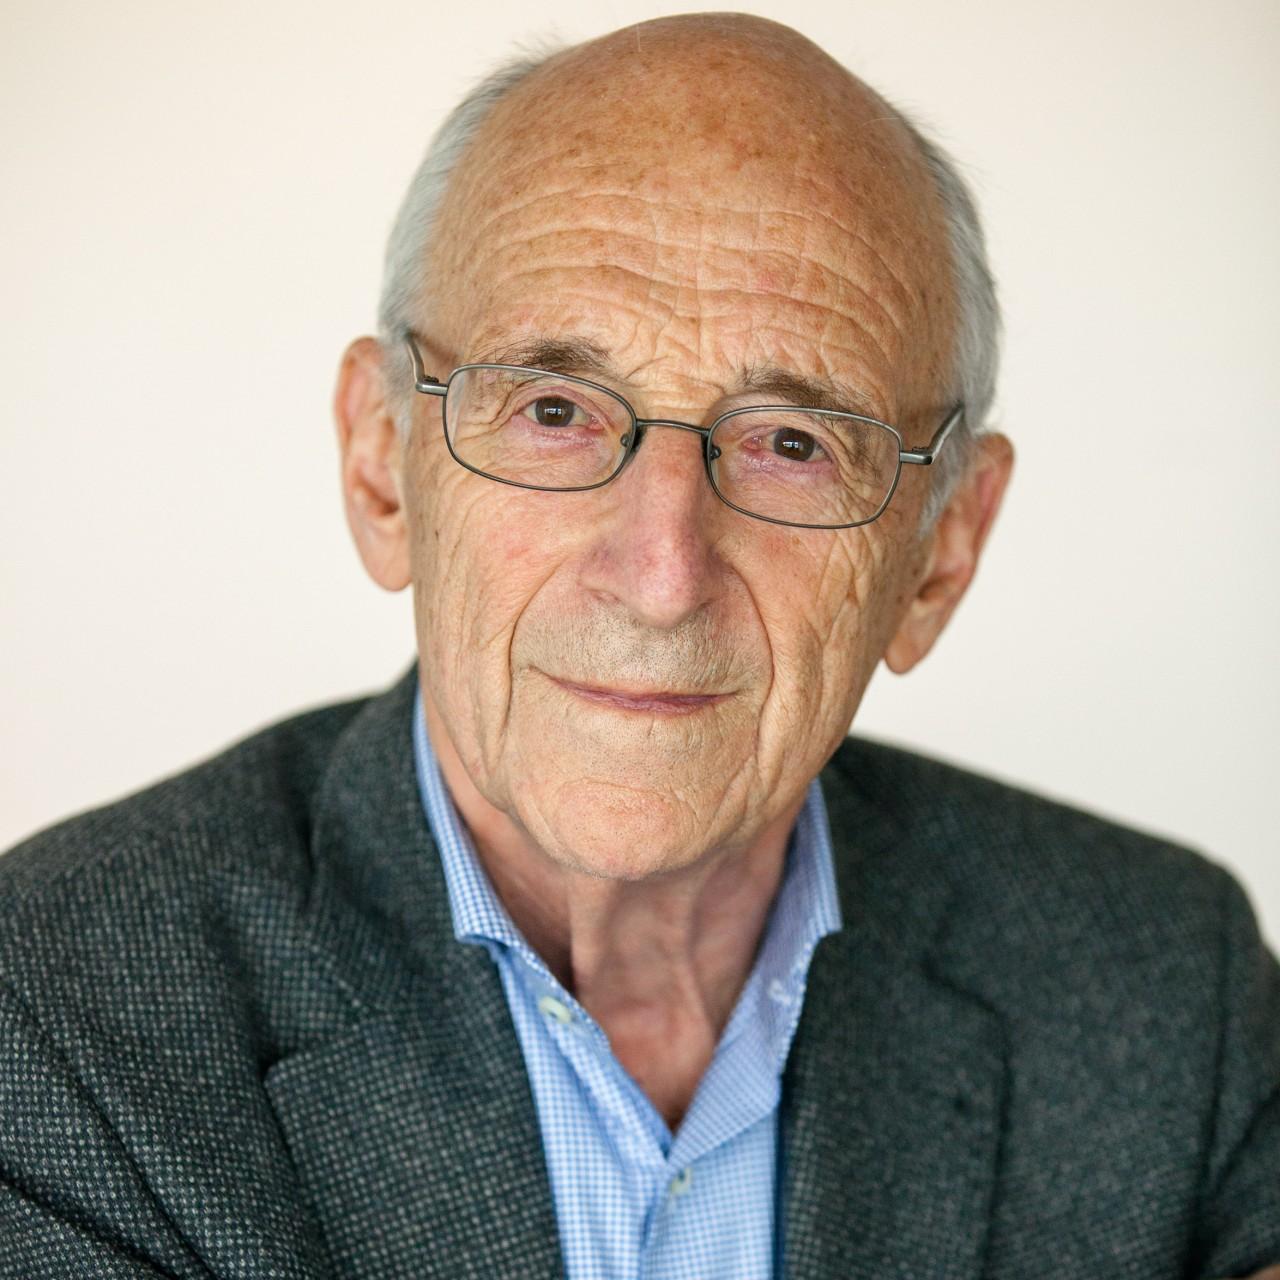 Drs J. (Joost) van Gelder